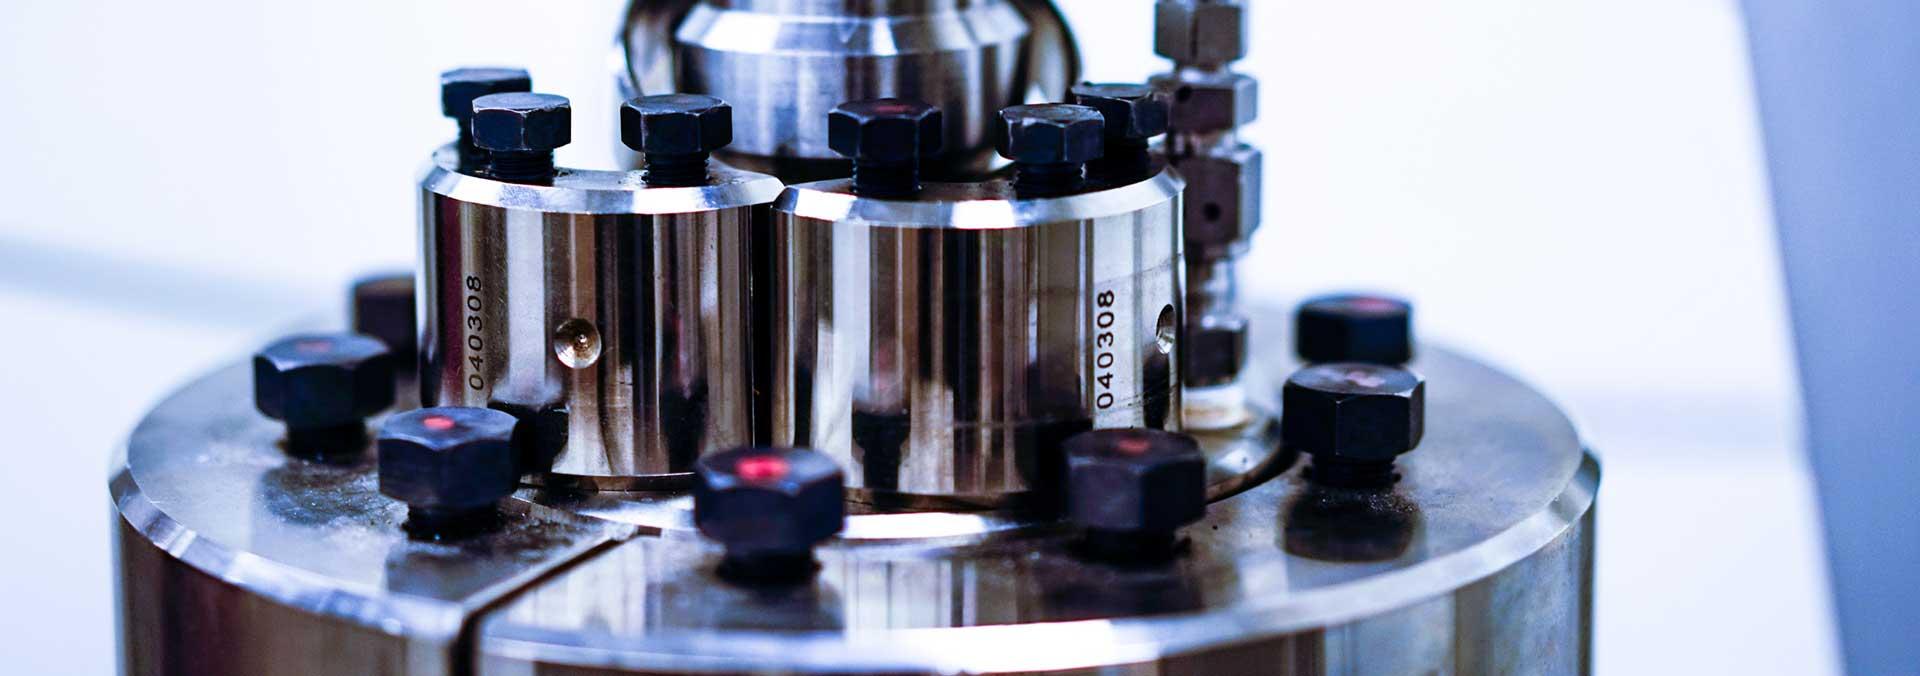 Fachübersetzung Maschinenbau Engineering